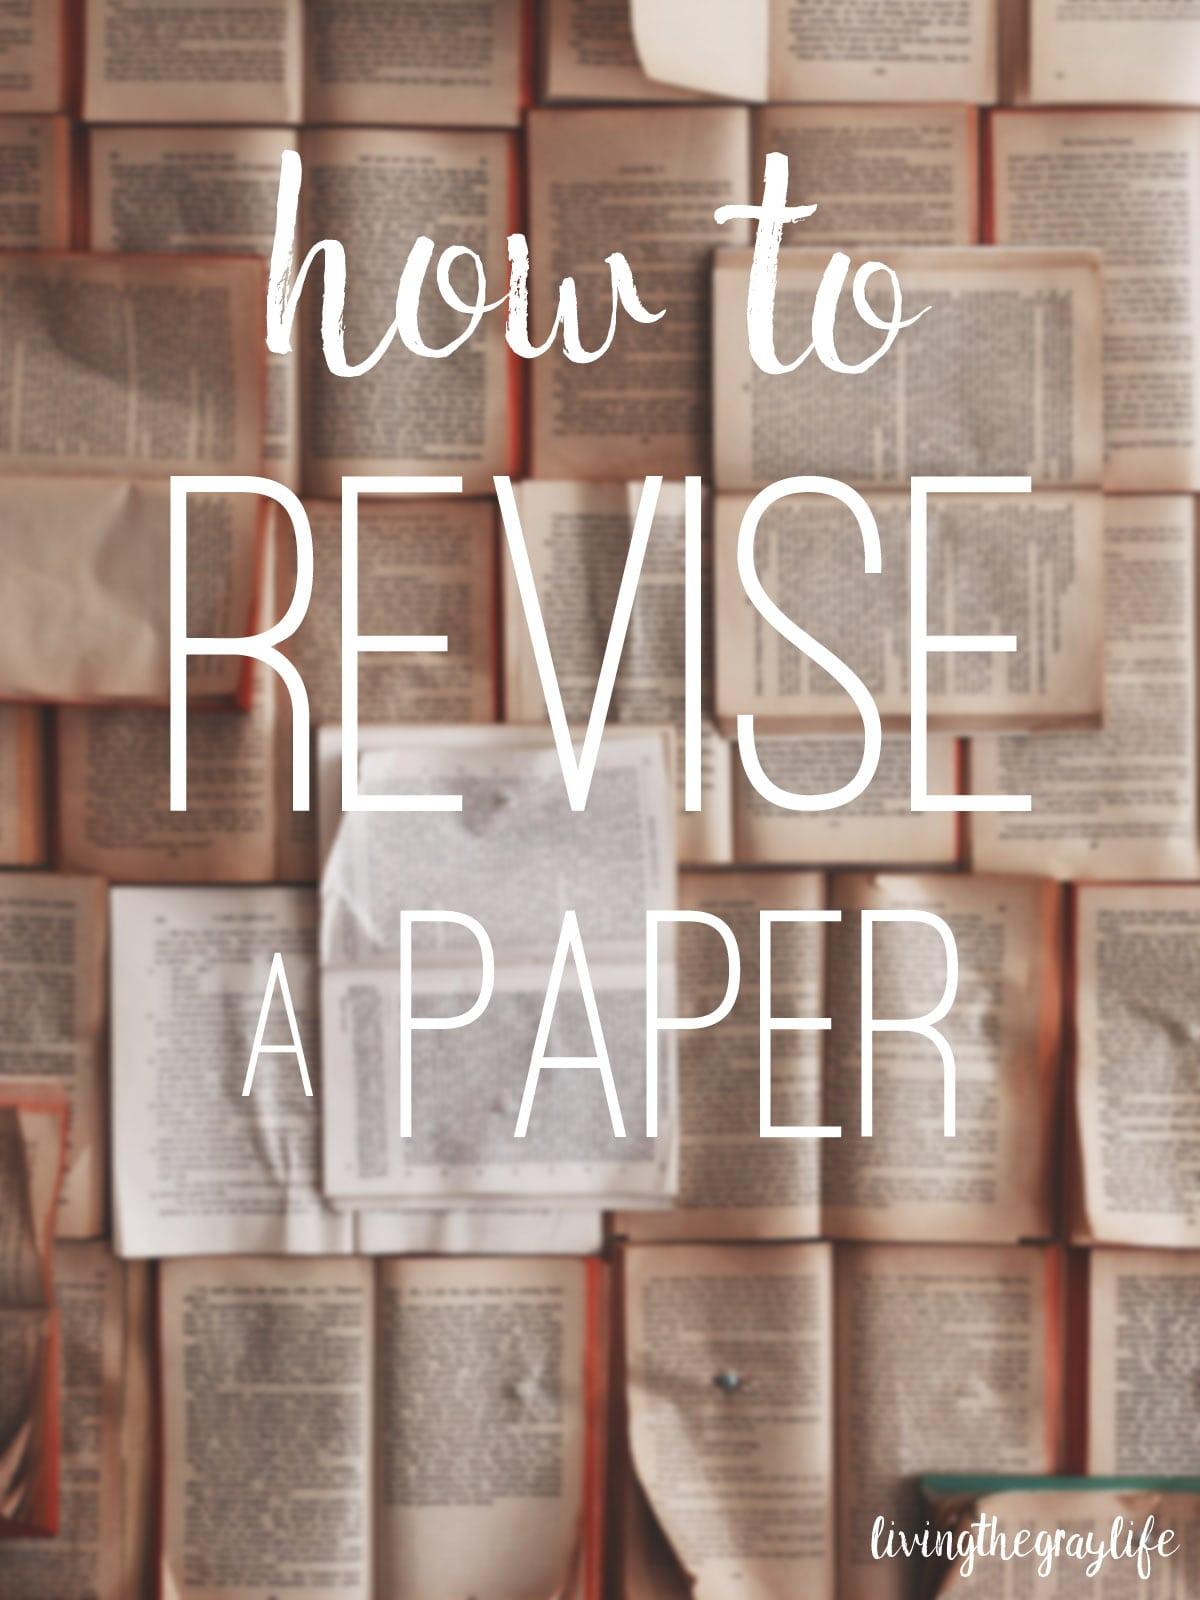 Revise essay